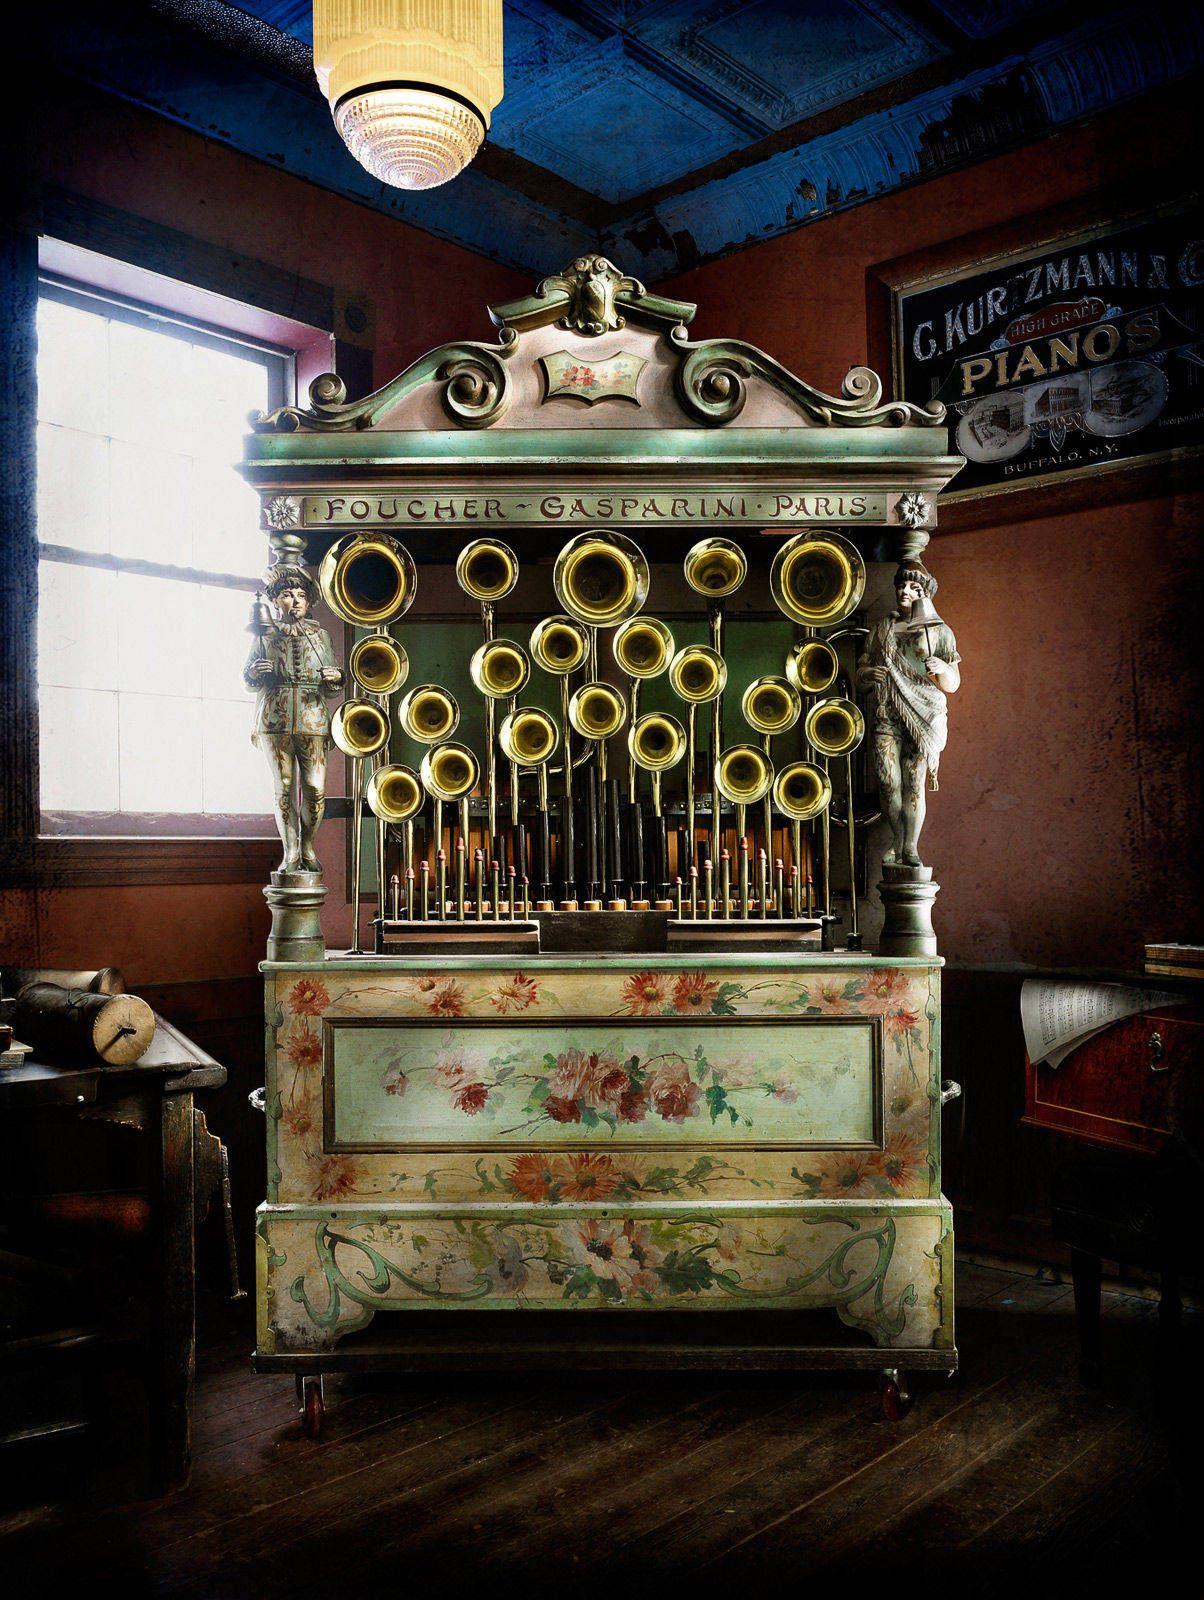 Gasparini Street Organ by Harold Ross